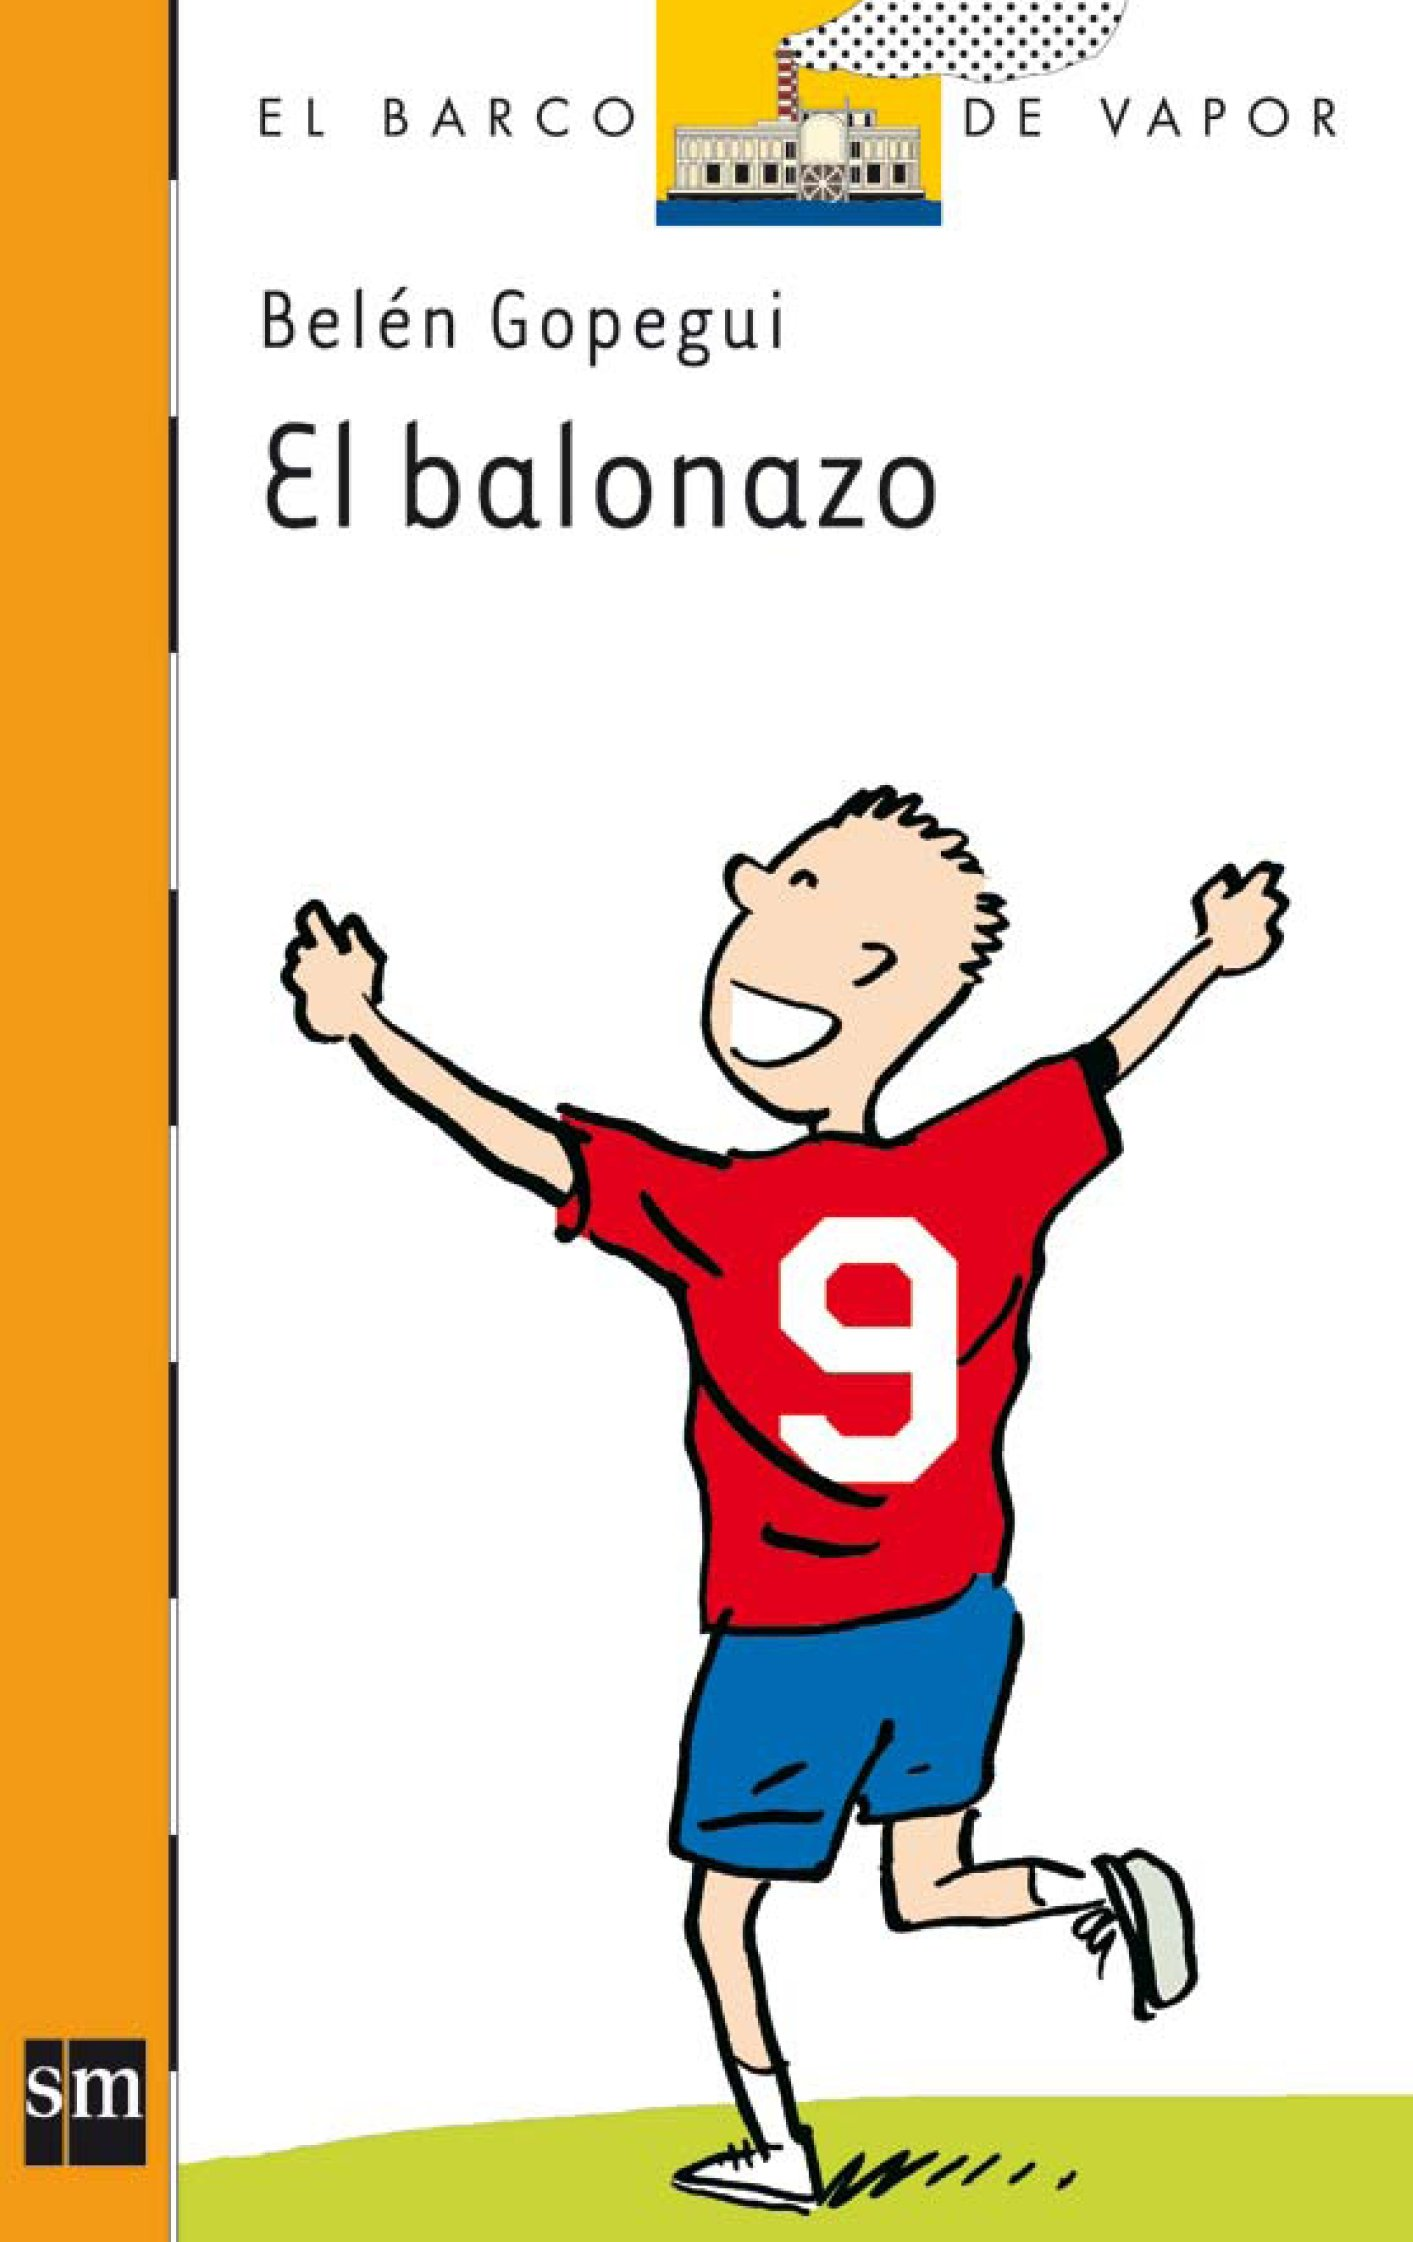 El balonazo (El Barco de Vapor Naranja, Band 201) (Spanisch) Taschenbuch –  21. Juli 2008